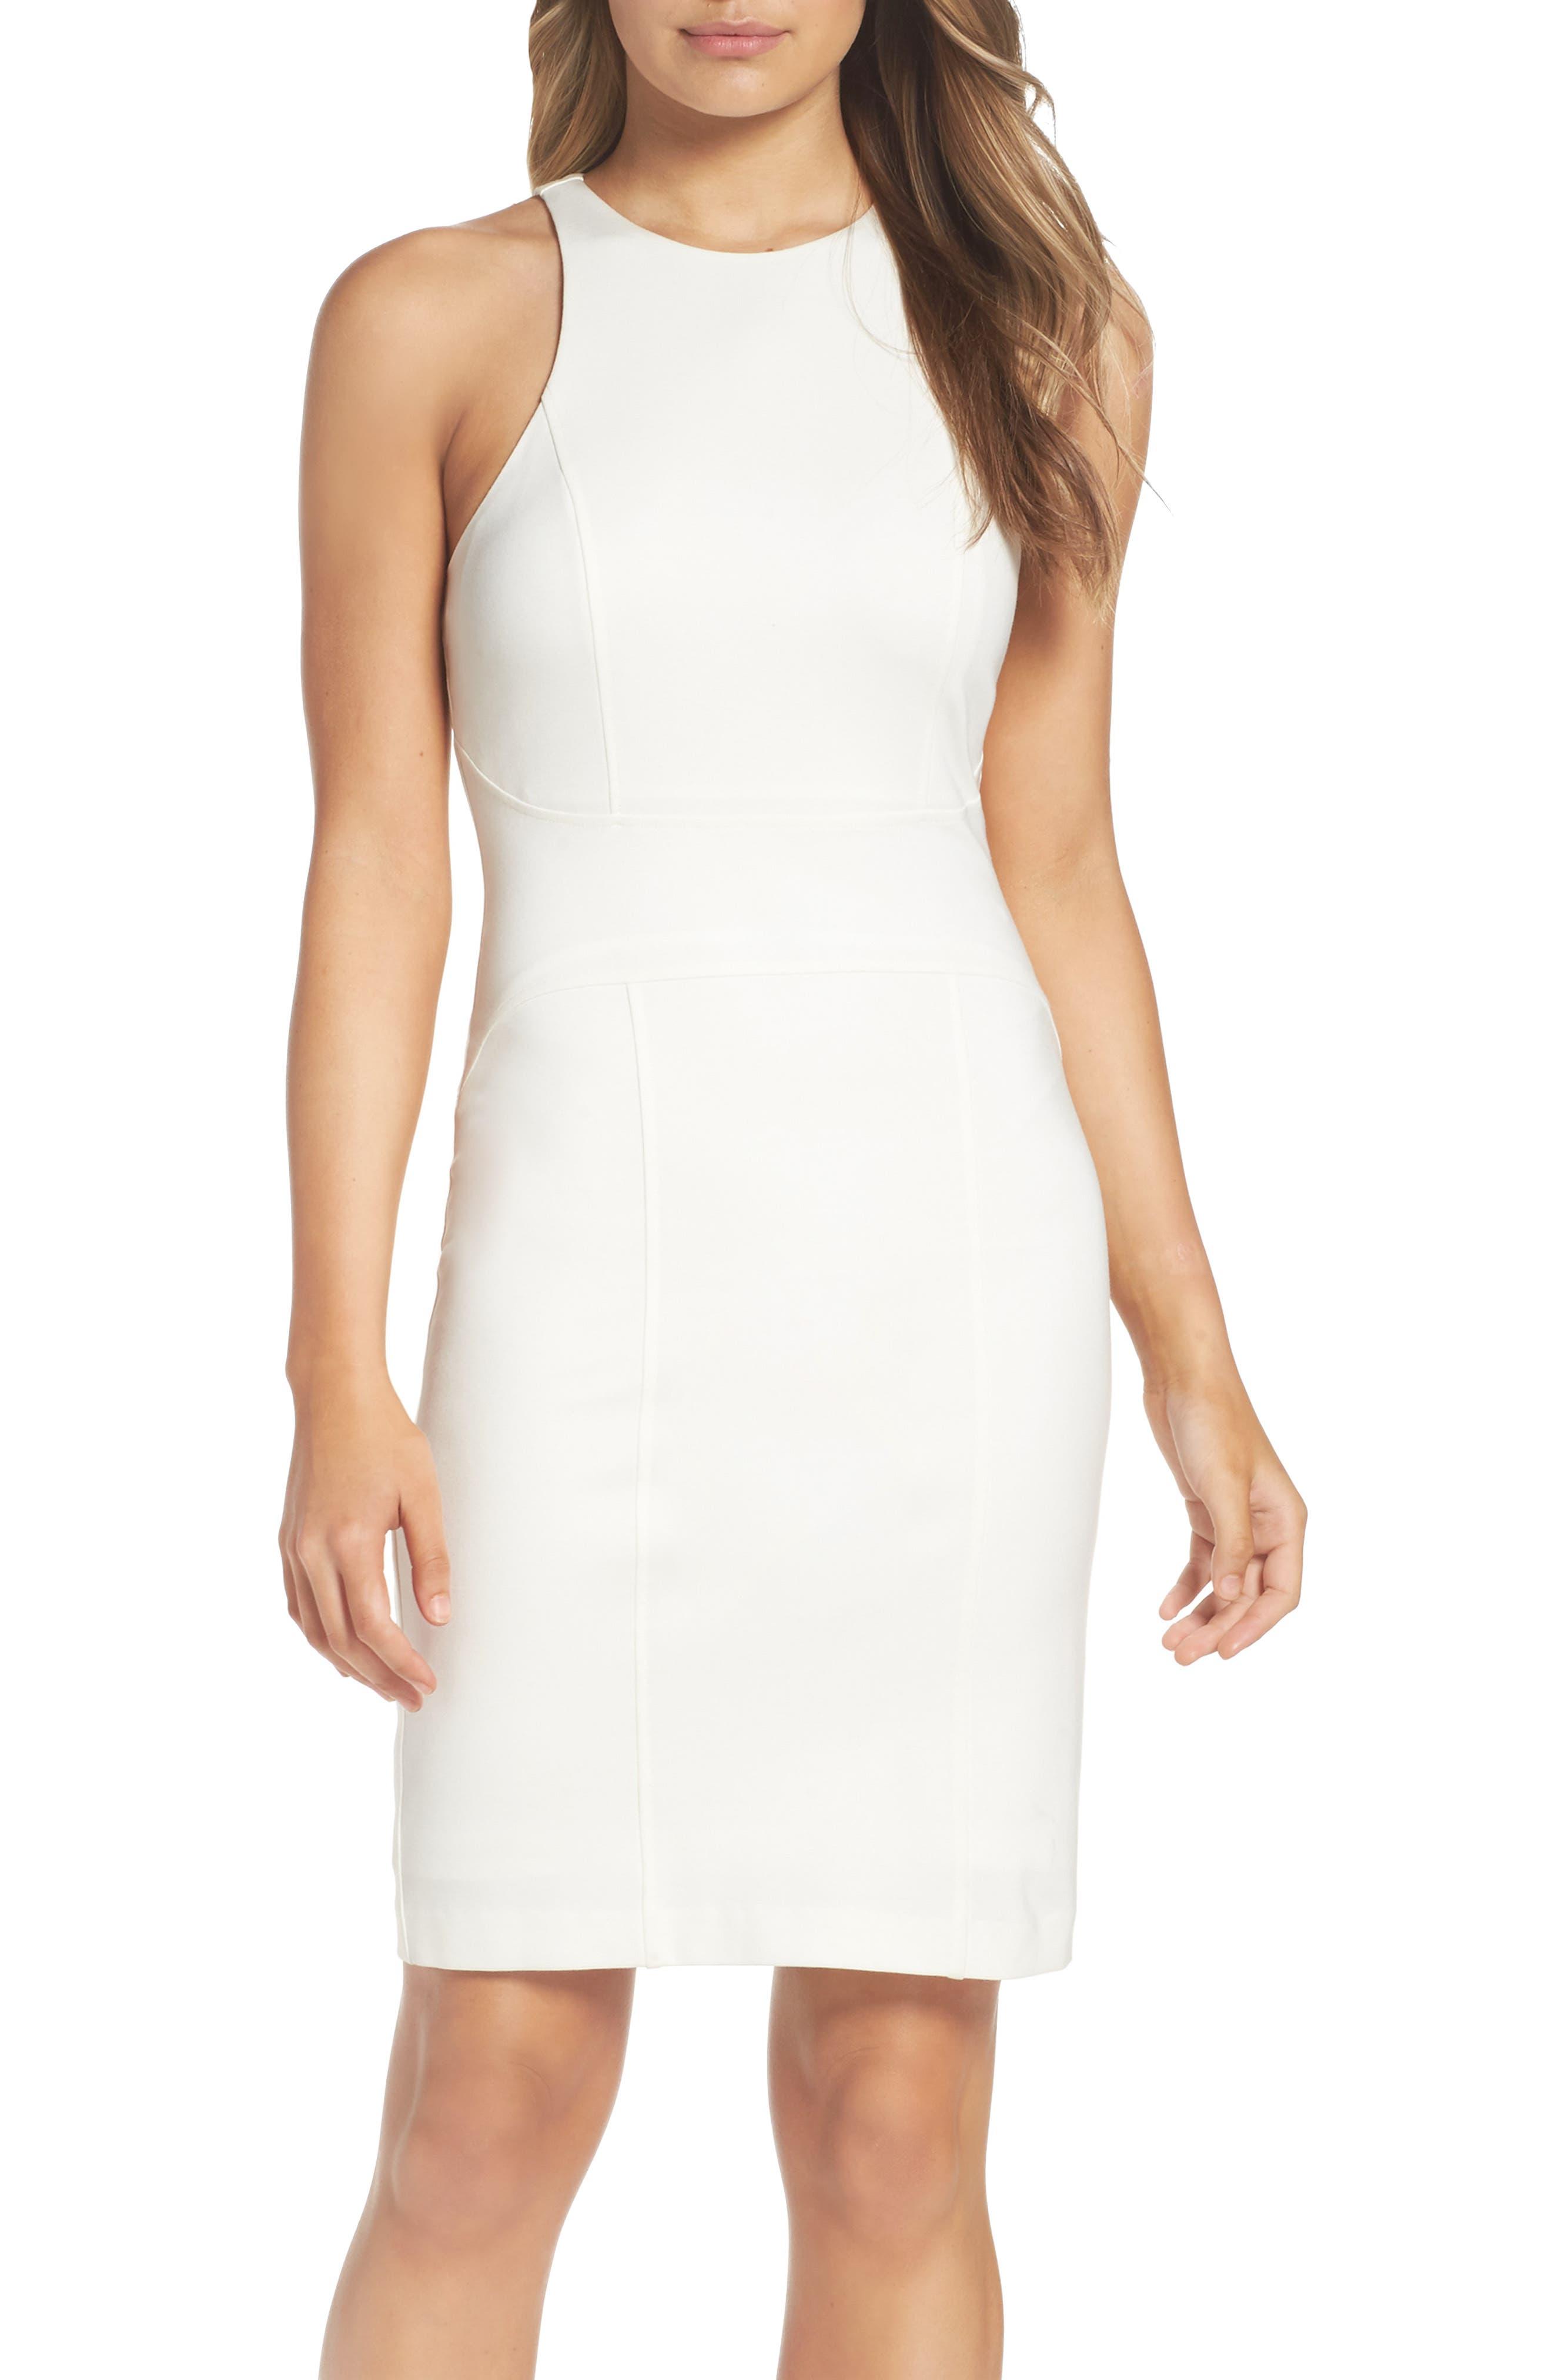 You Ruin Me Body-Con Dress,                             Main thumbnail 1, color,                             White